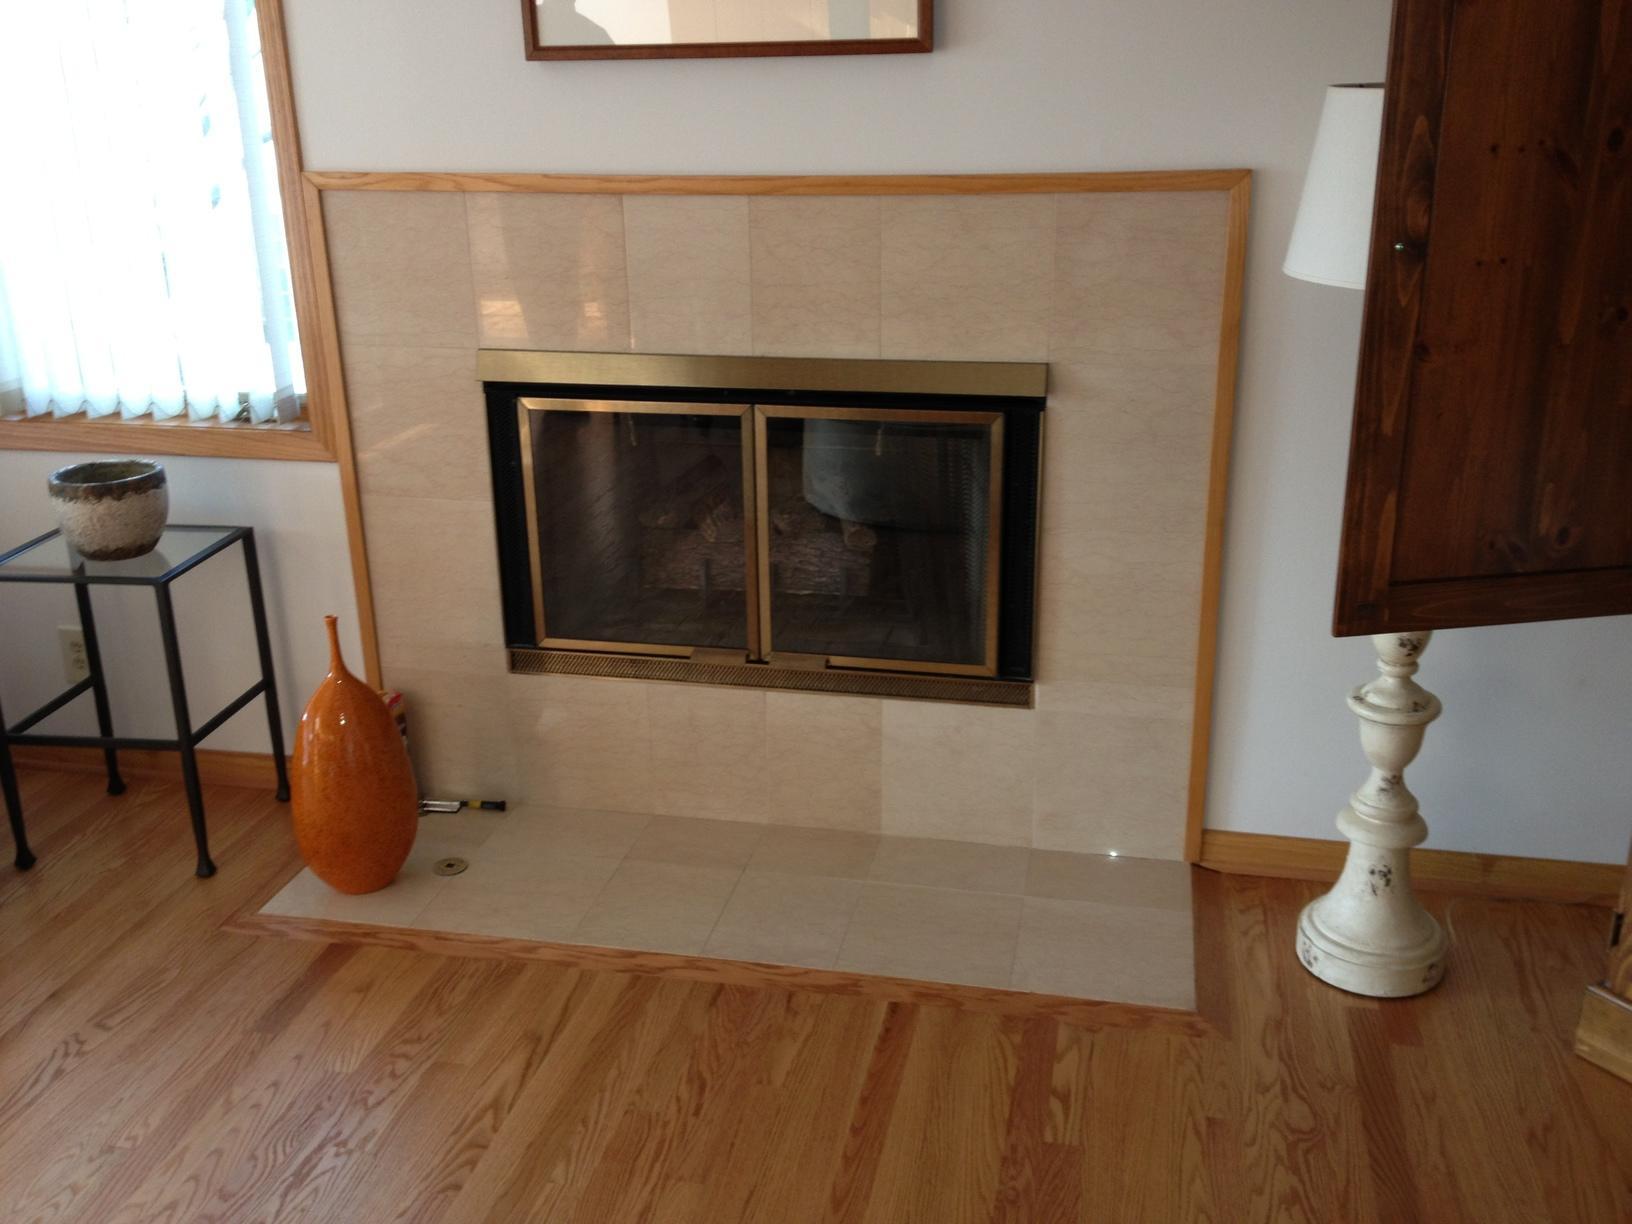 85604-fireplace-bloomington-1